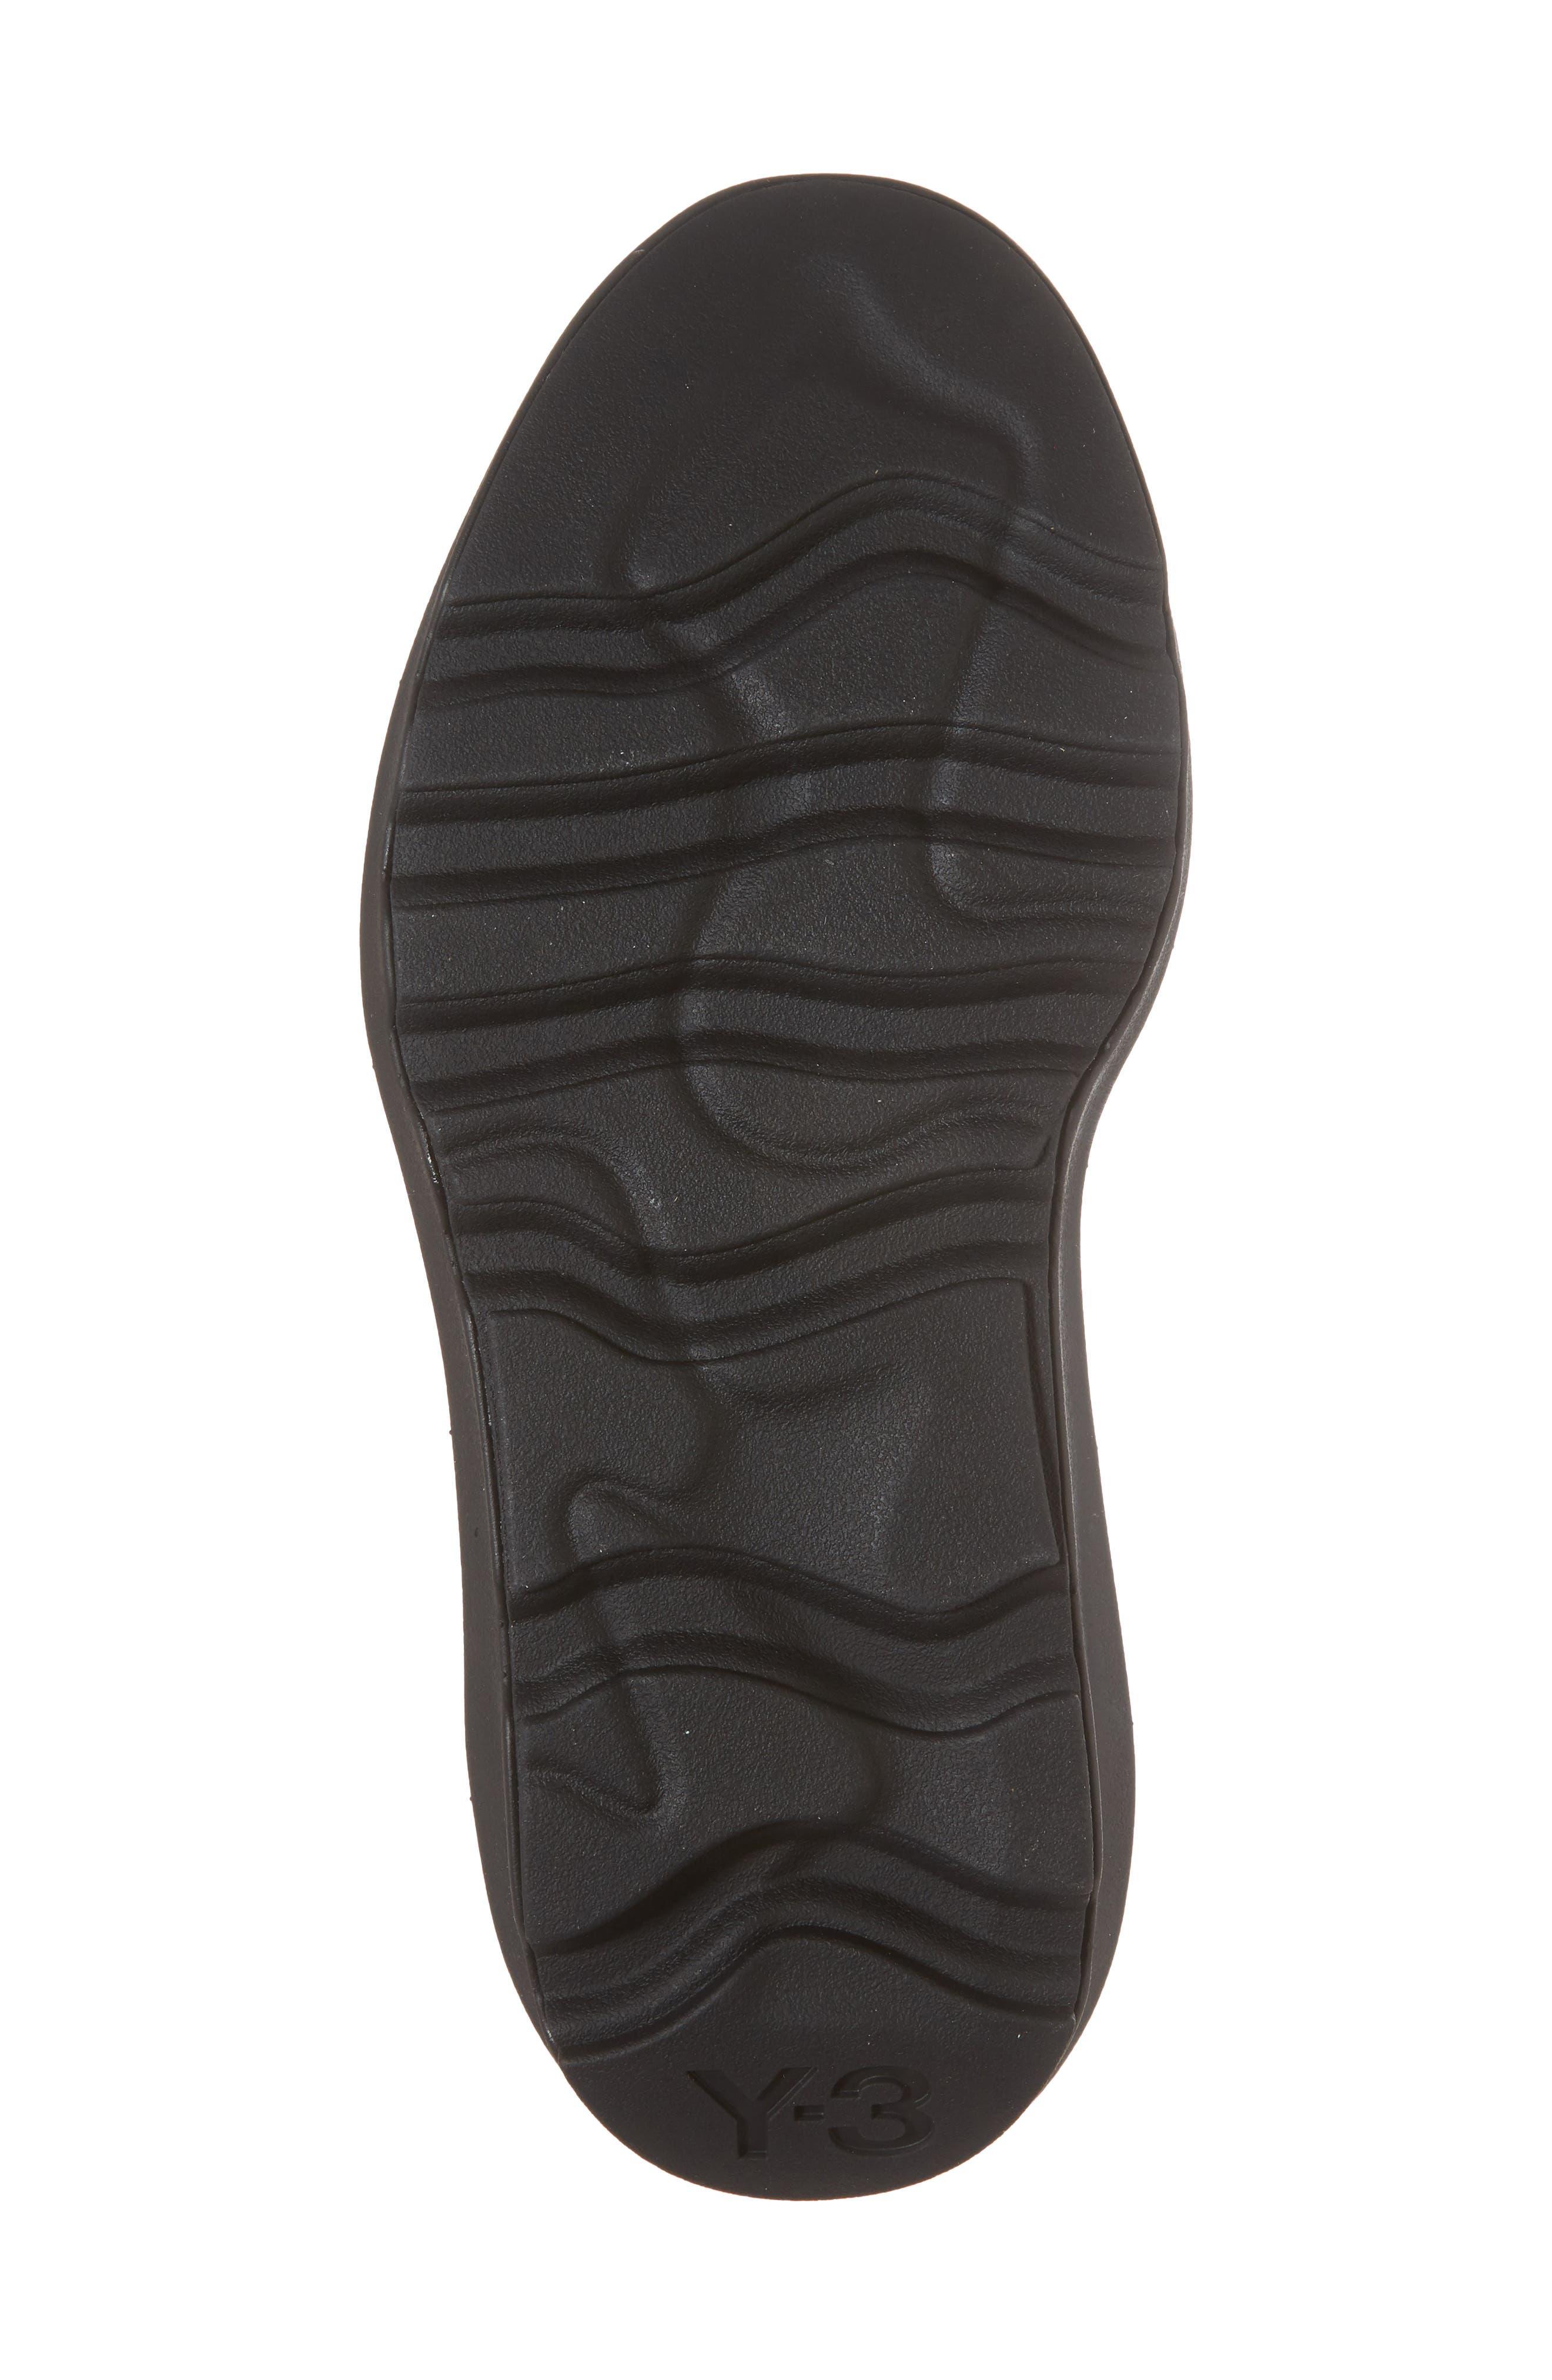 Superbou Sneaker,                             Alternate thumbnail 6, color,                             Black / Core White